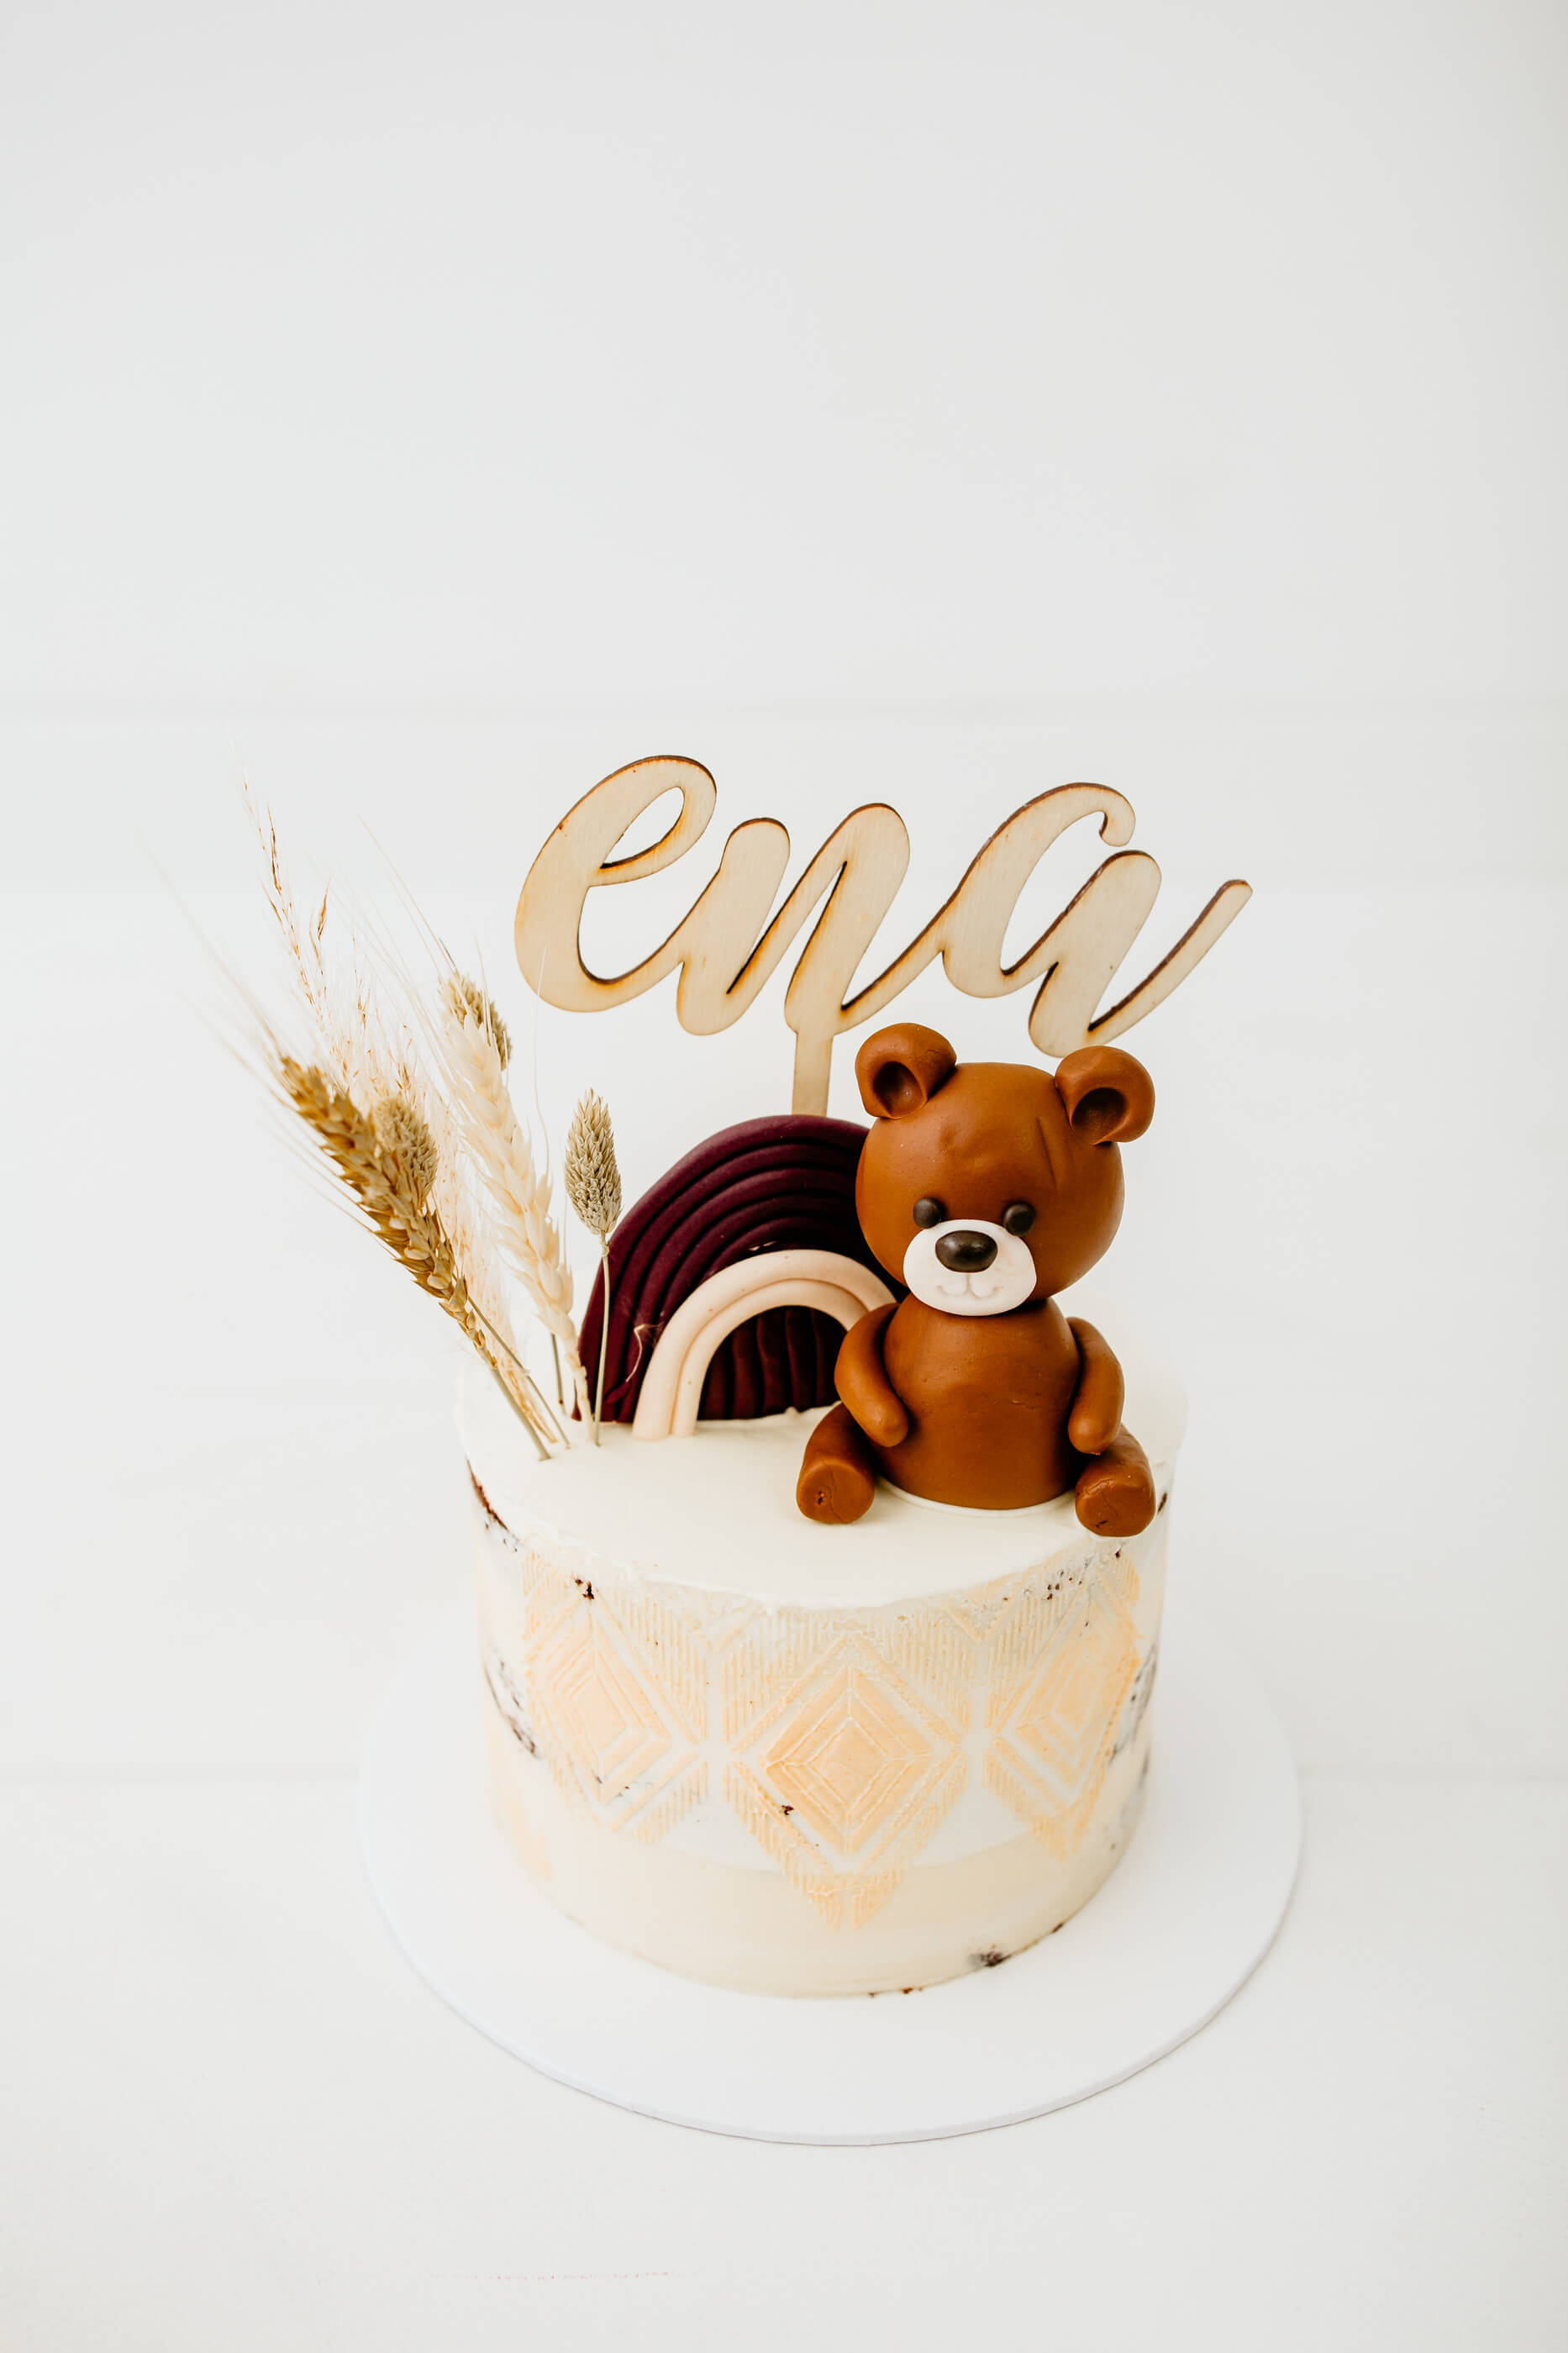 Cake smash- Luanina pravljica - fotografiranje nosečnic, novorojenckov, druzinic, nosecniska fotografija 14